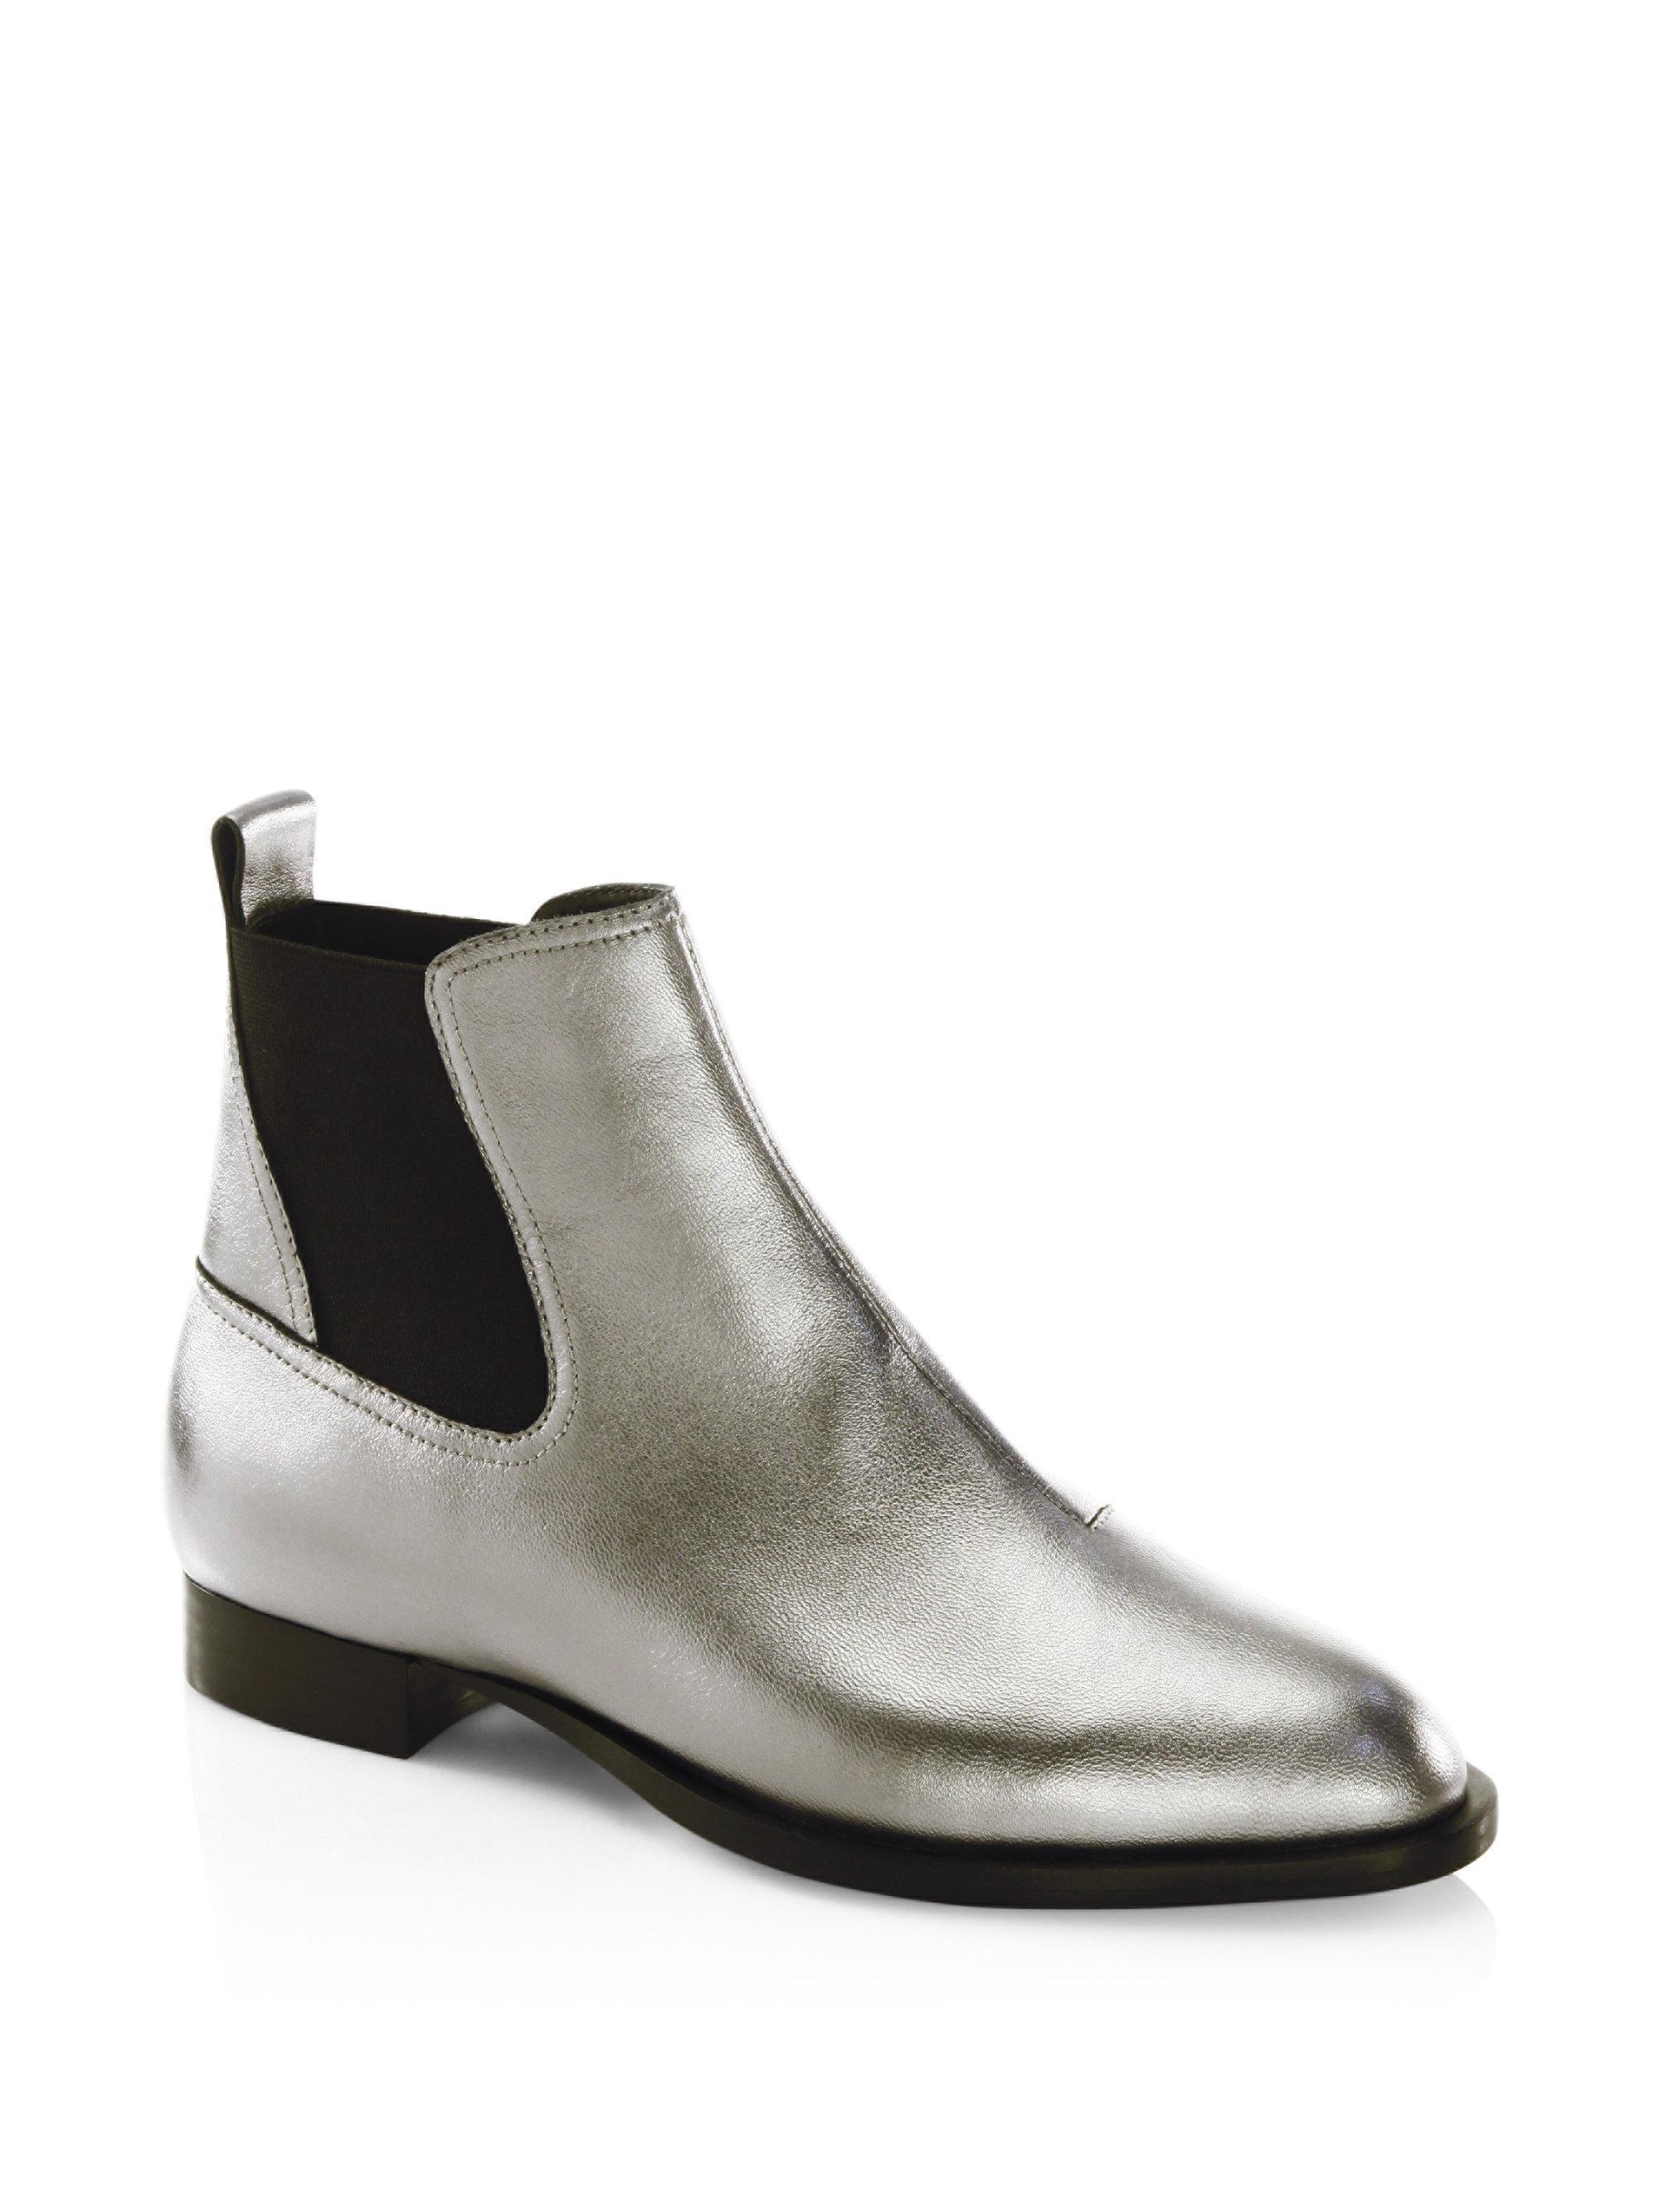 RAG&BONE Women's Mason Pointed-Toe Metallic Leather Low-Heel Booties SmLiHUfg